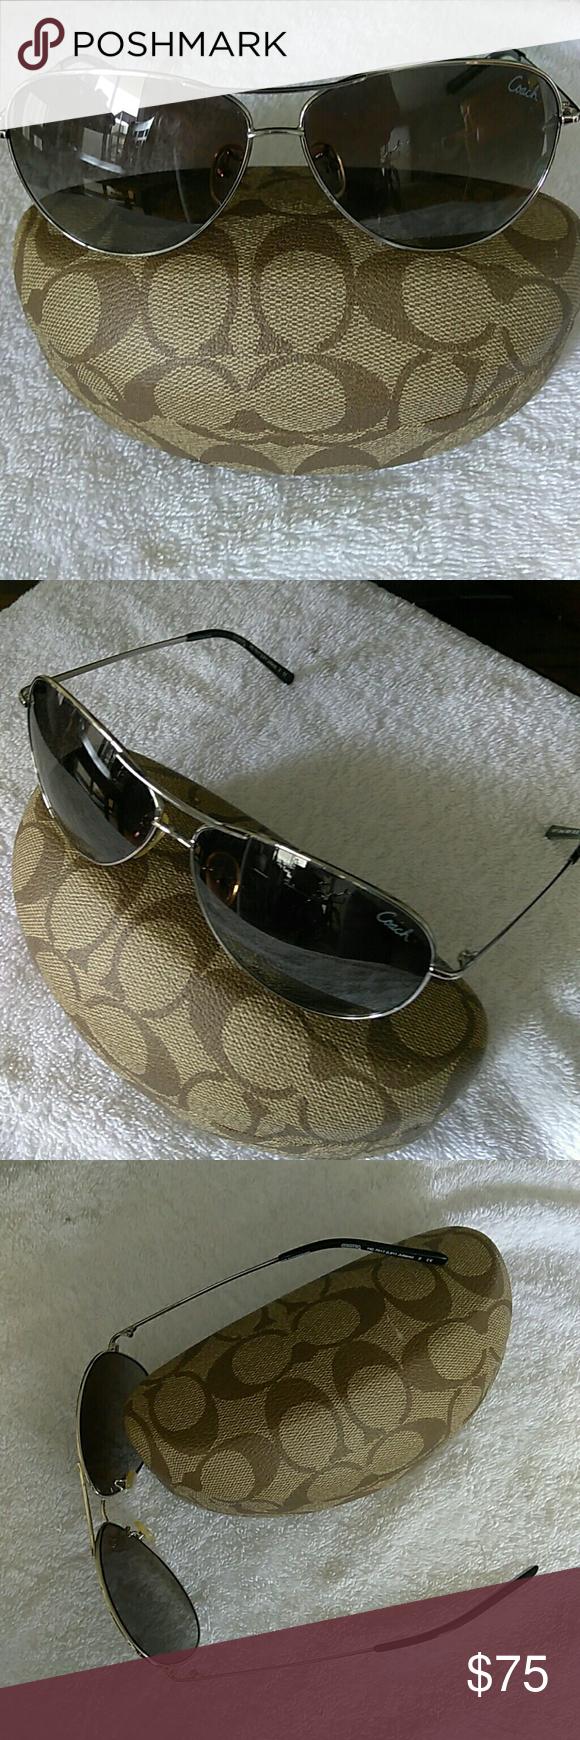 234cf59507a6 ... spain coach authentic sunglasses hc 7017 l911 juliana perfect condition  never used coach accessories sunglasses 8fa2b